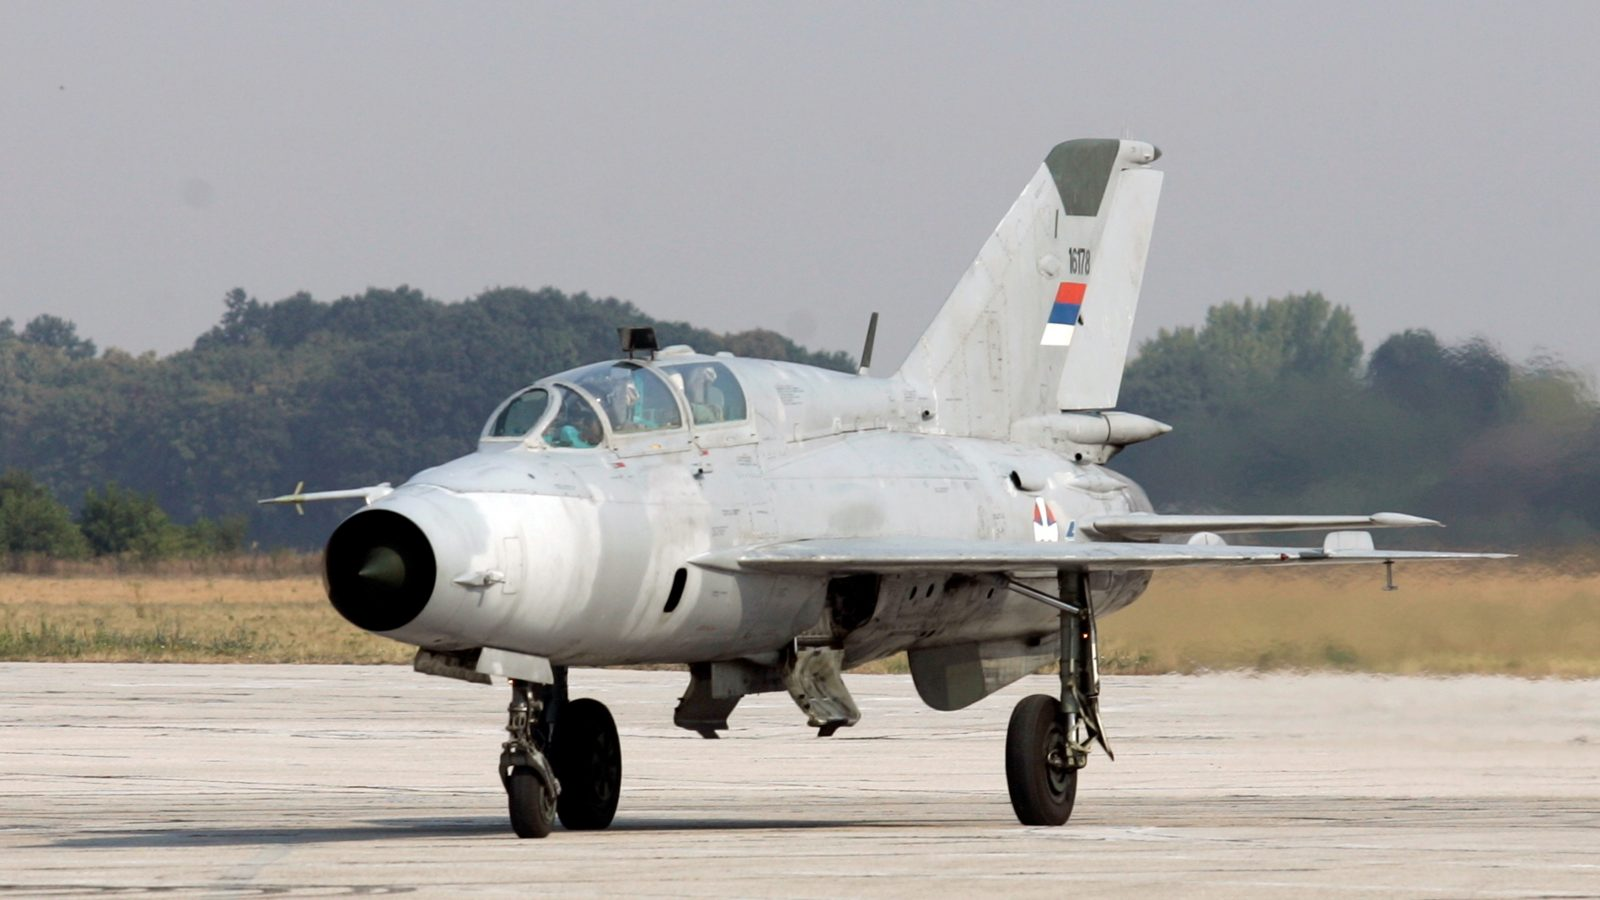 Serbian MiG-21 Crashes Near Bosnian Border, Killing Both Pilots ...